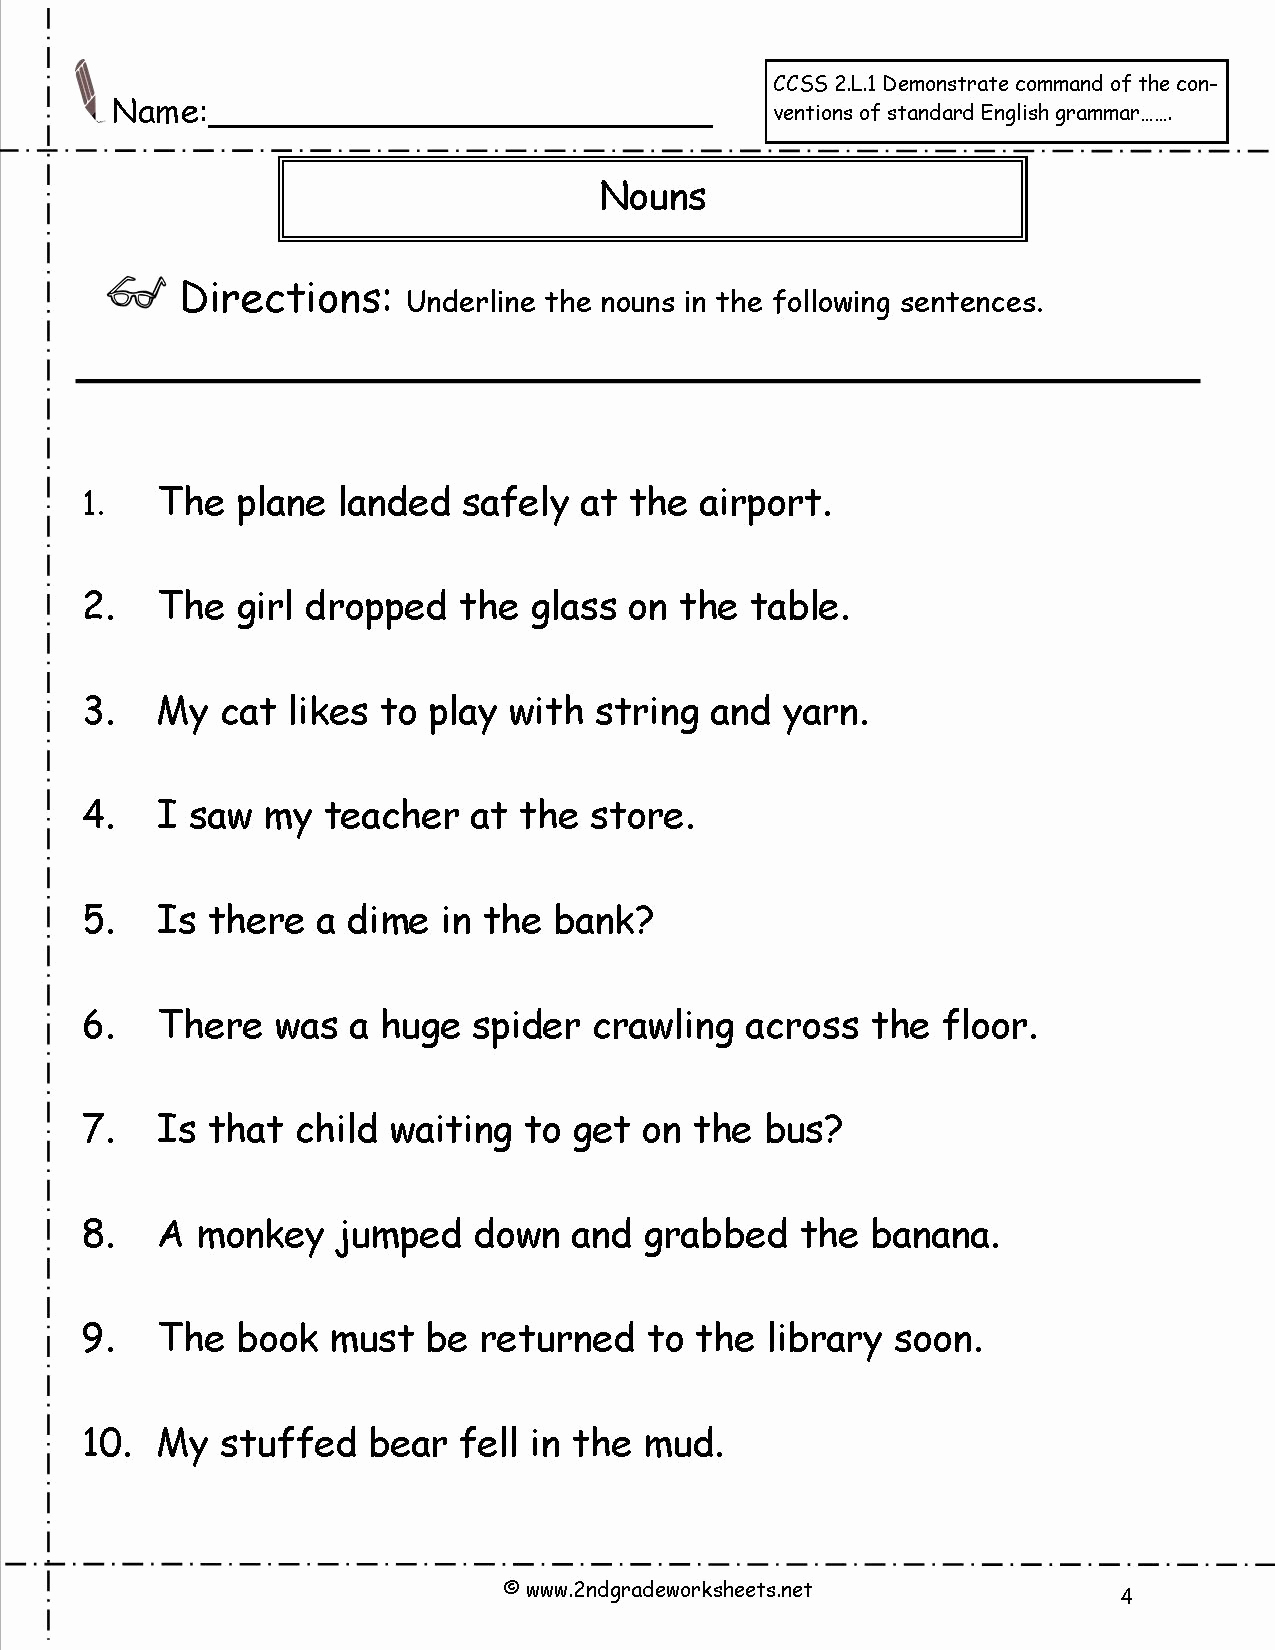 Pronoun Worksheets 2nd Grade Beautiful 20 Second Grade Pronouns Worksheet